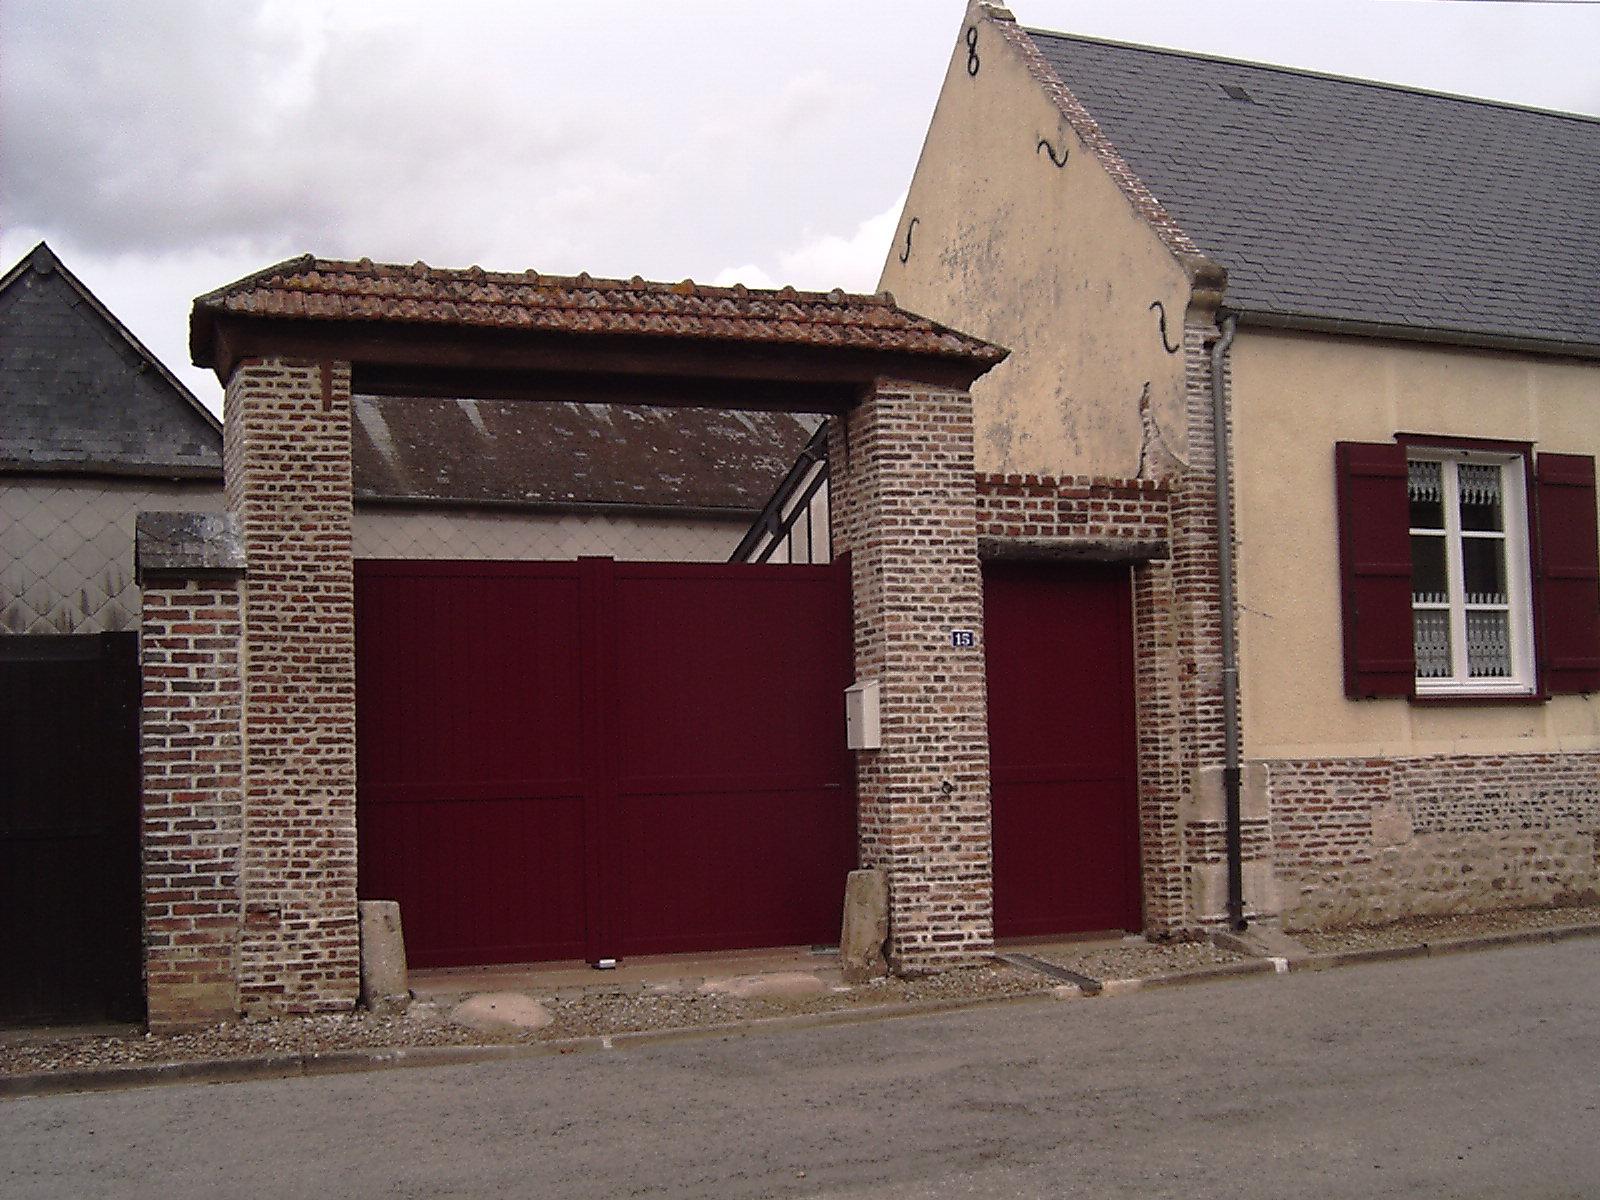 Portail et Potillon Rimbaud